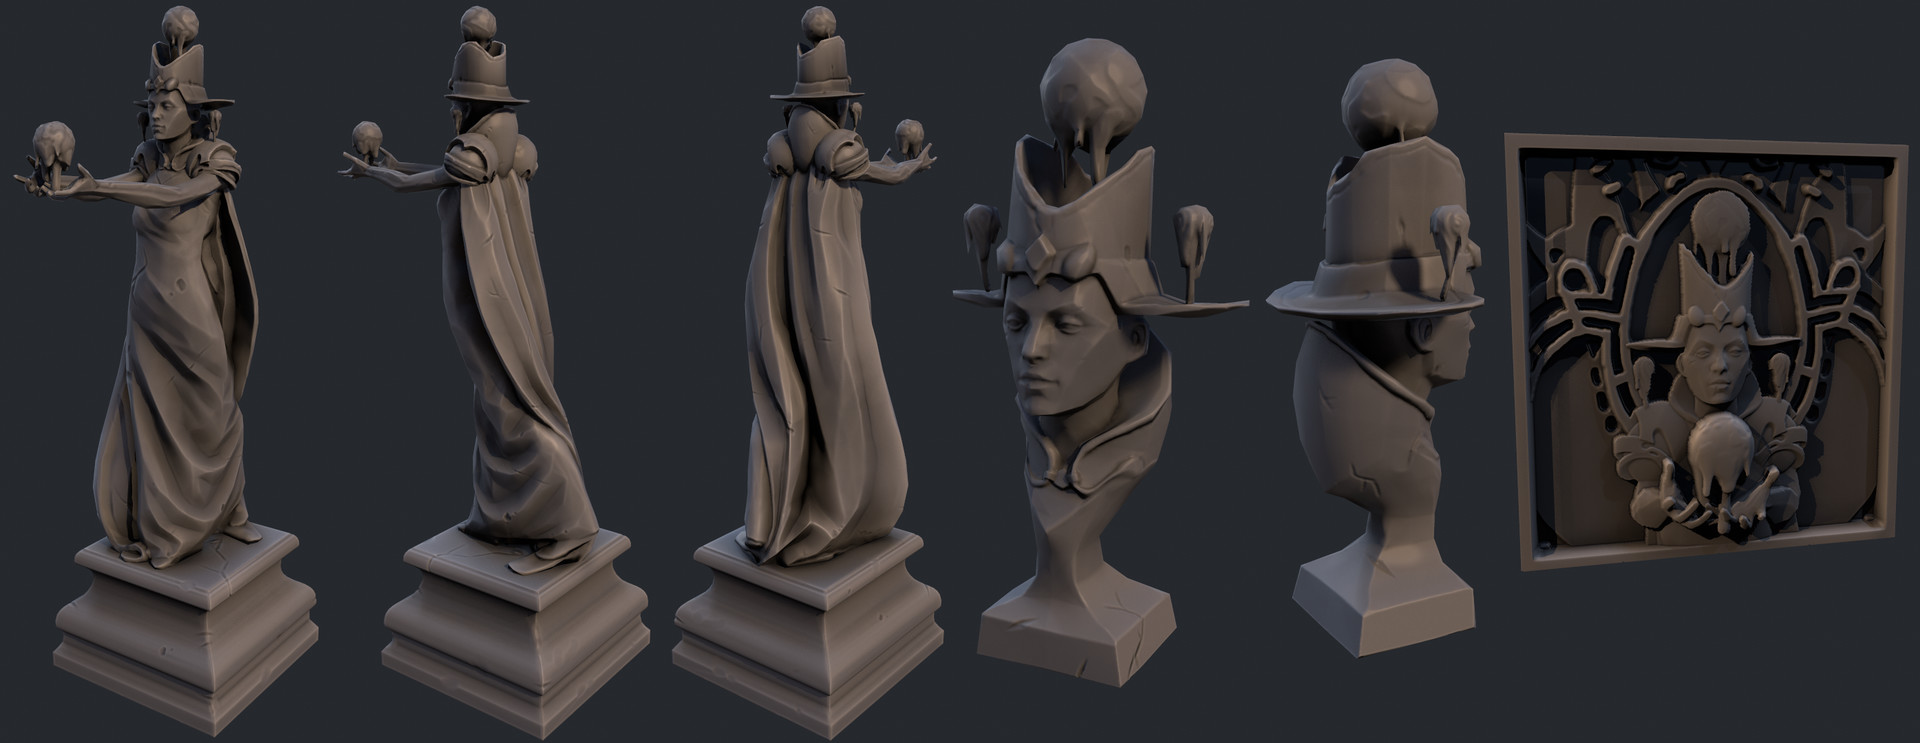 Dylan brady render statue